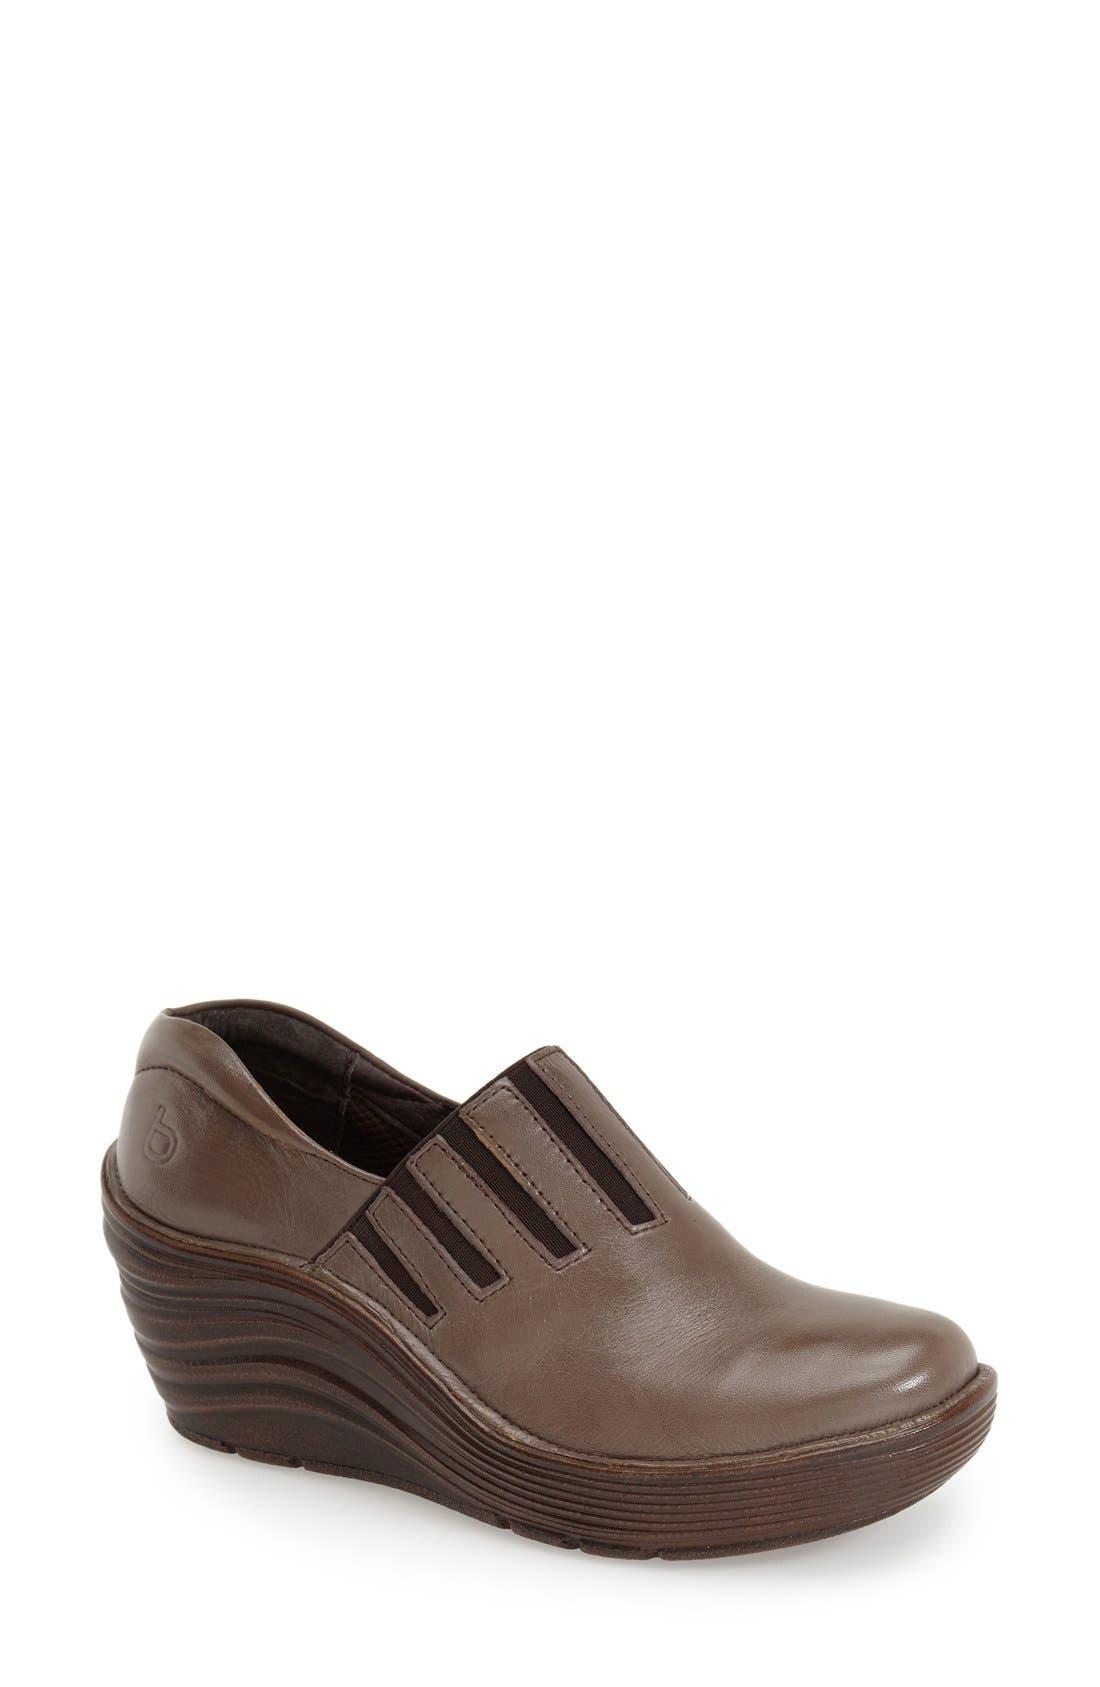 'Coast' Clog,                             Main thumbnail 1, color,                             Taupe Grey Leather